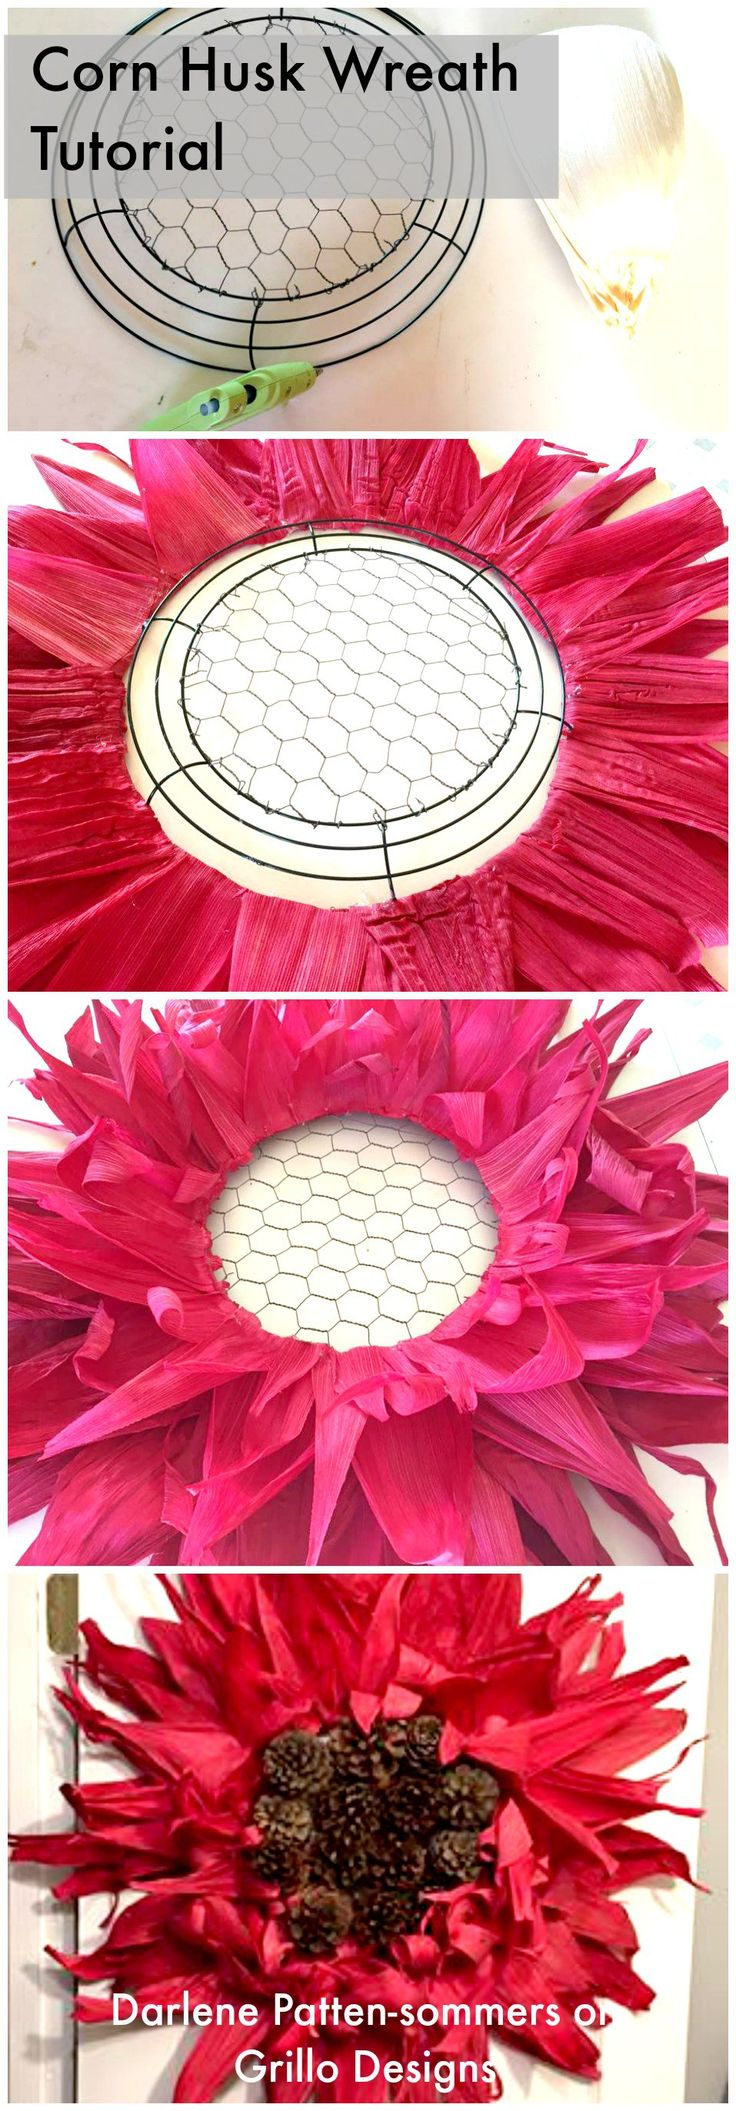 How to make a corn husk wreath!